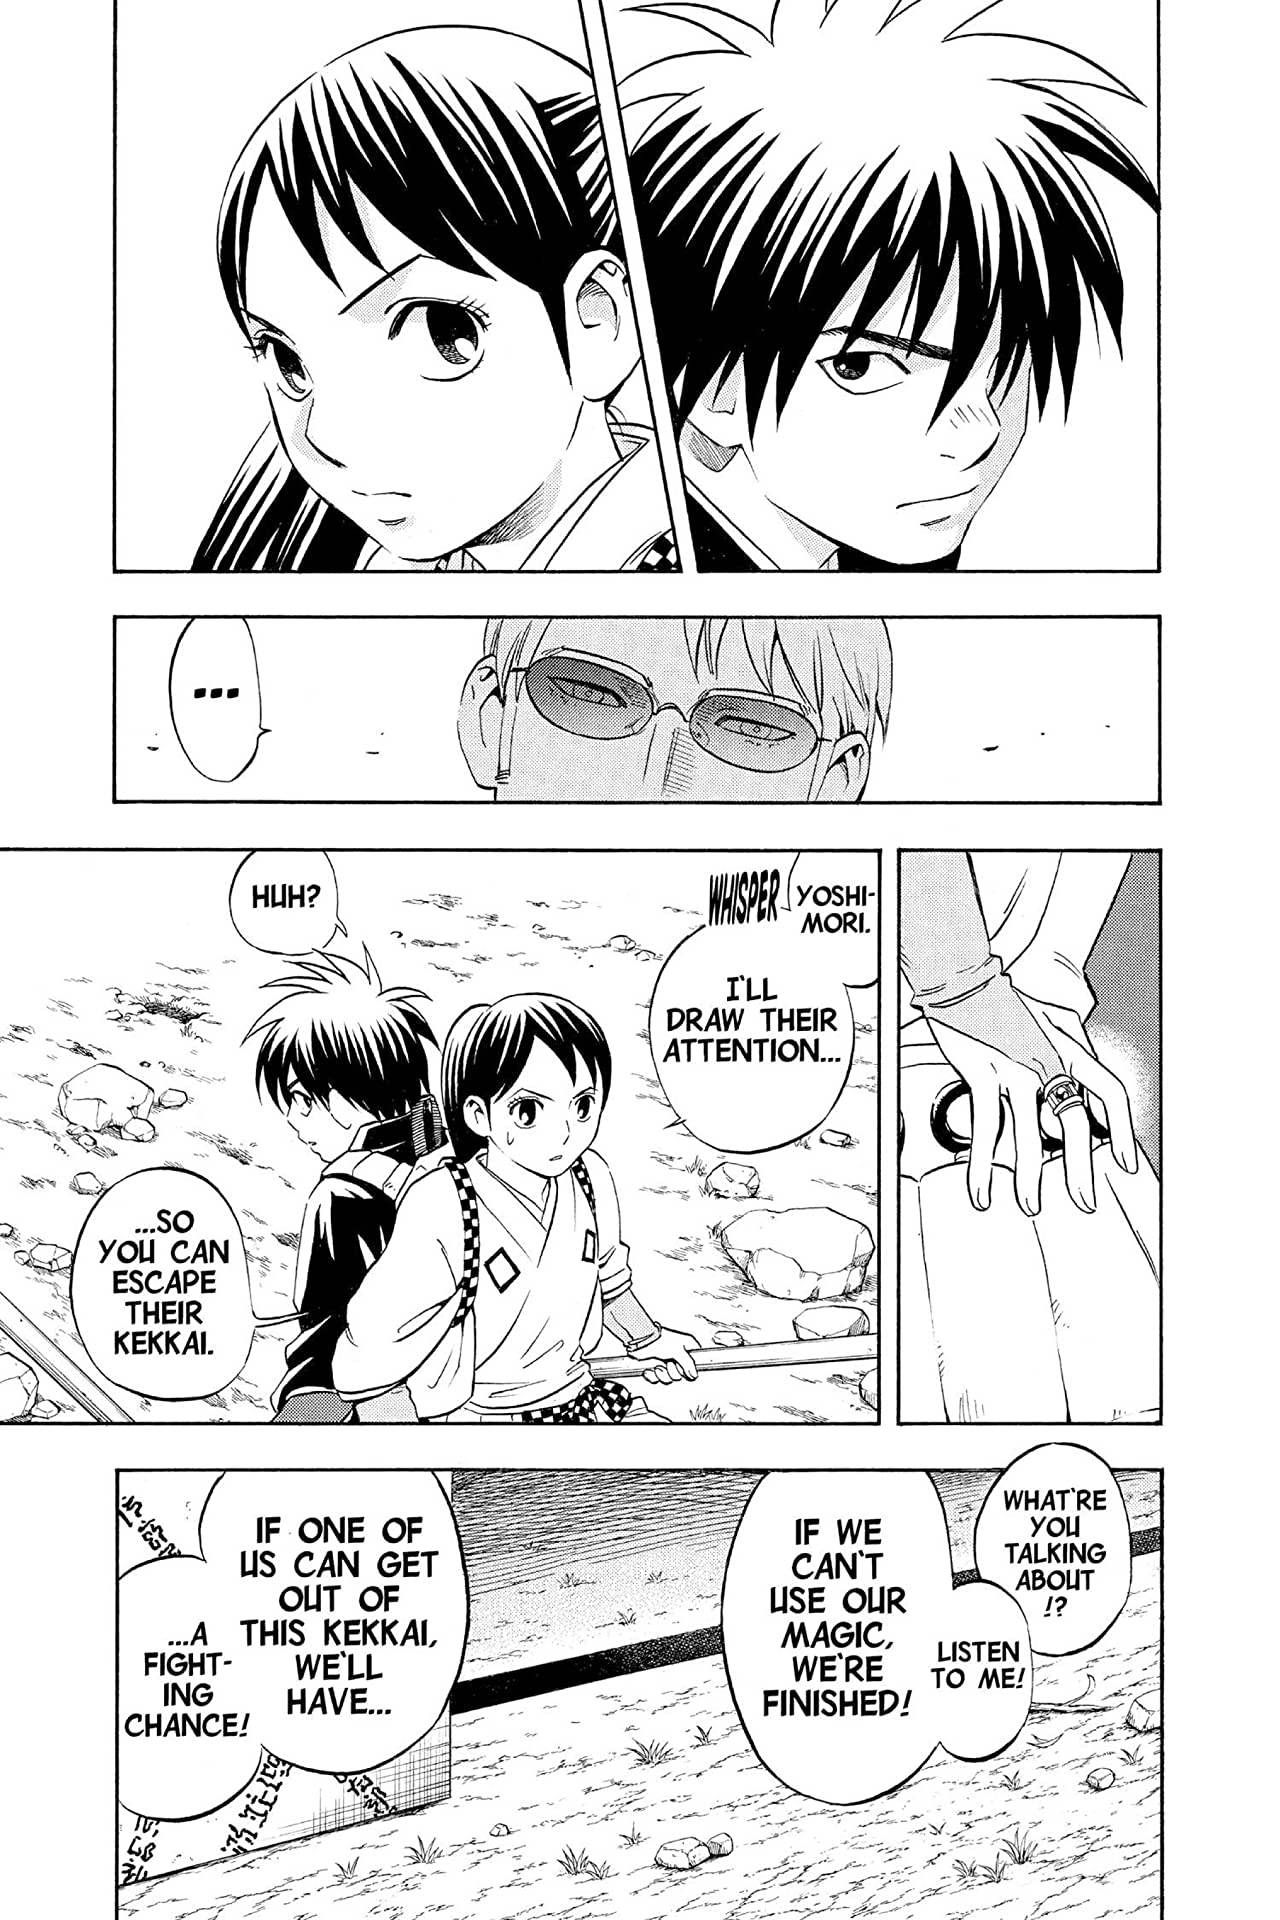 Kekkaishi Vol. 8